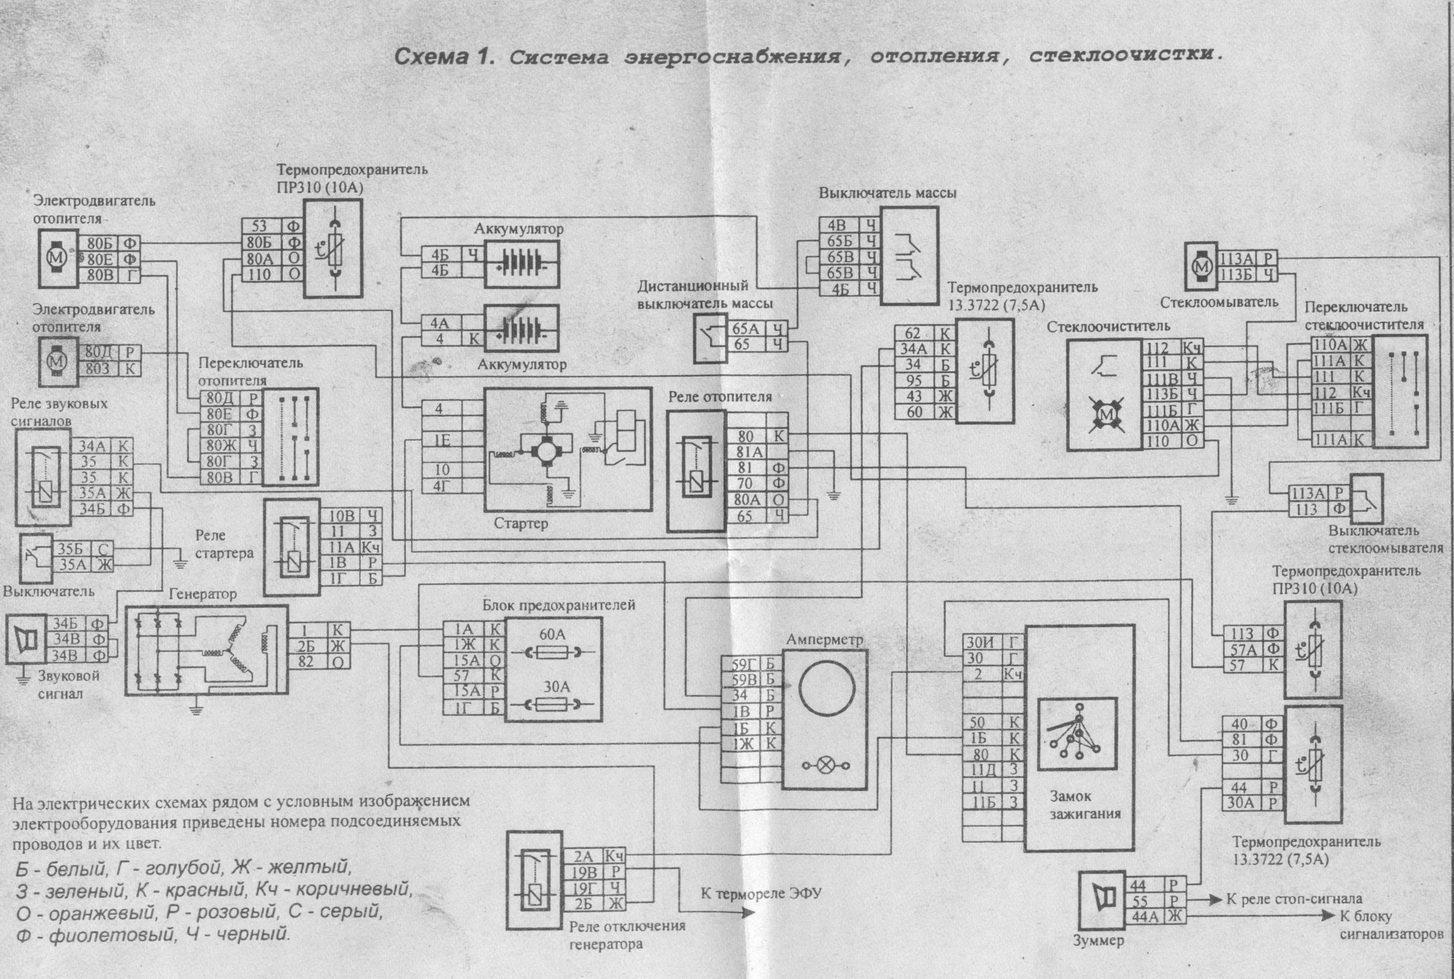 зл.схема реле-регулятора генератора г-4502.3771